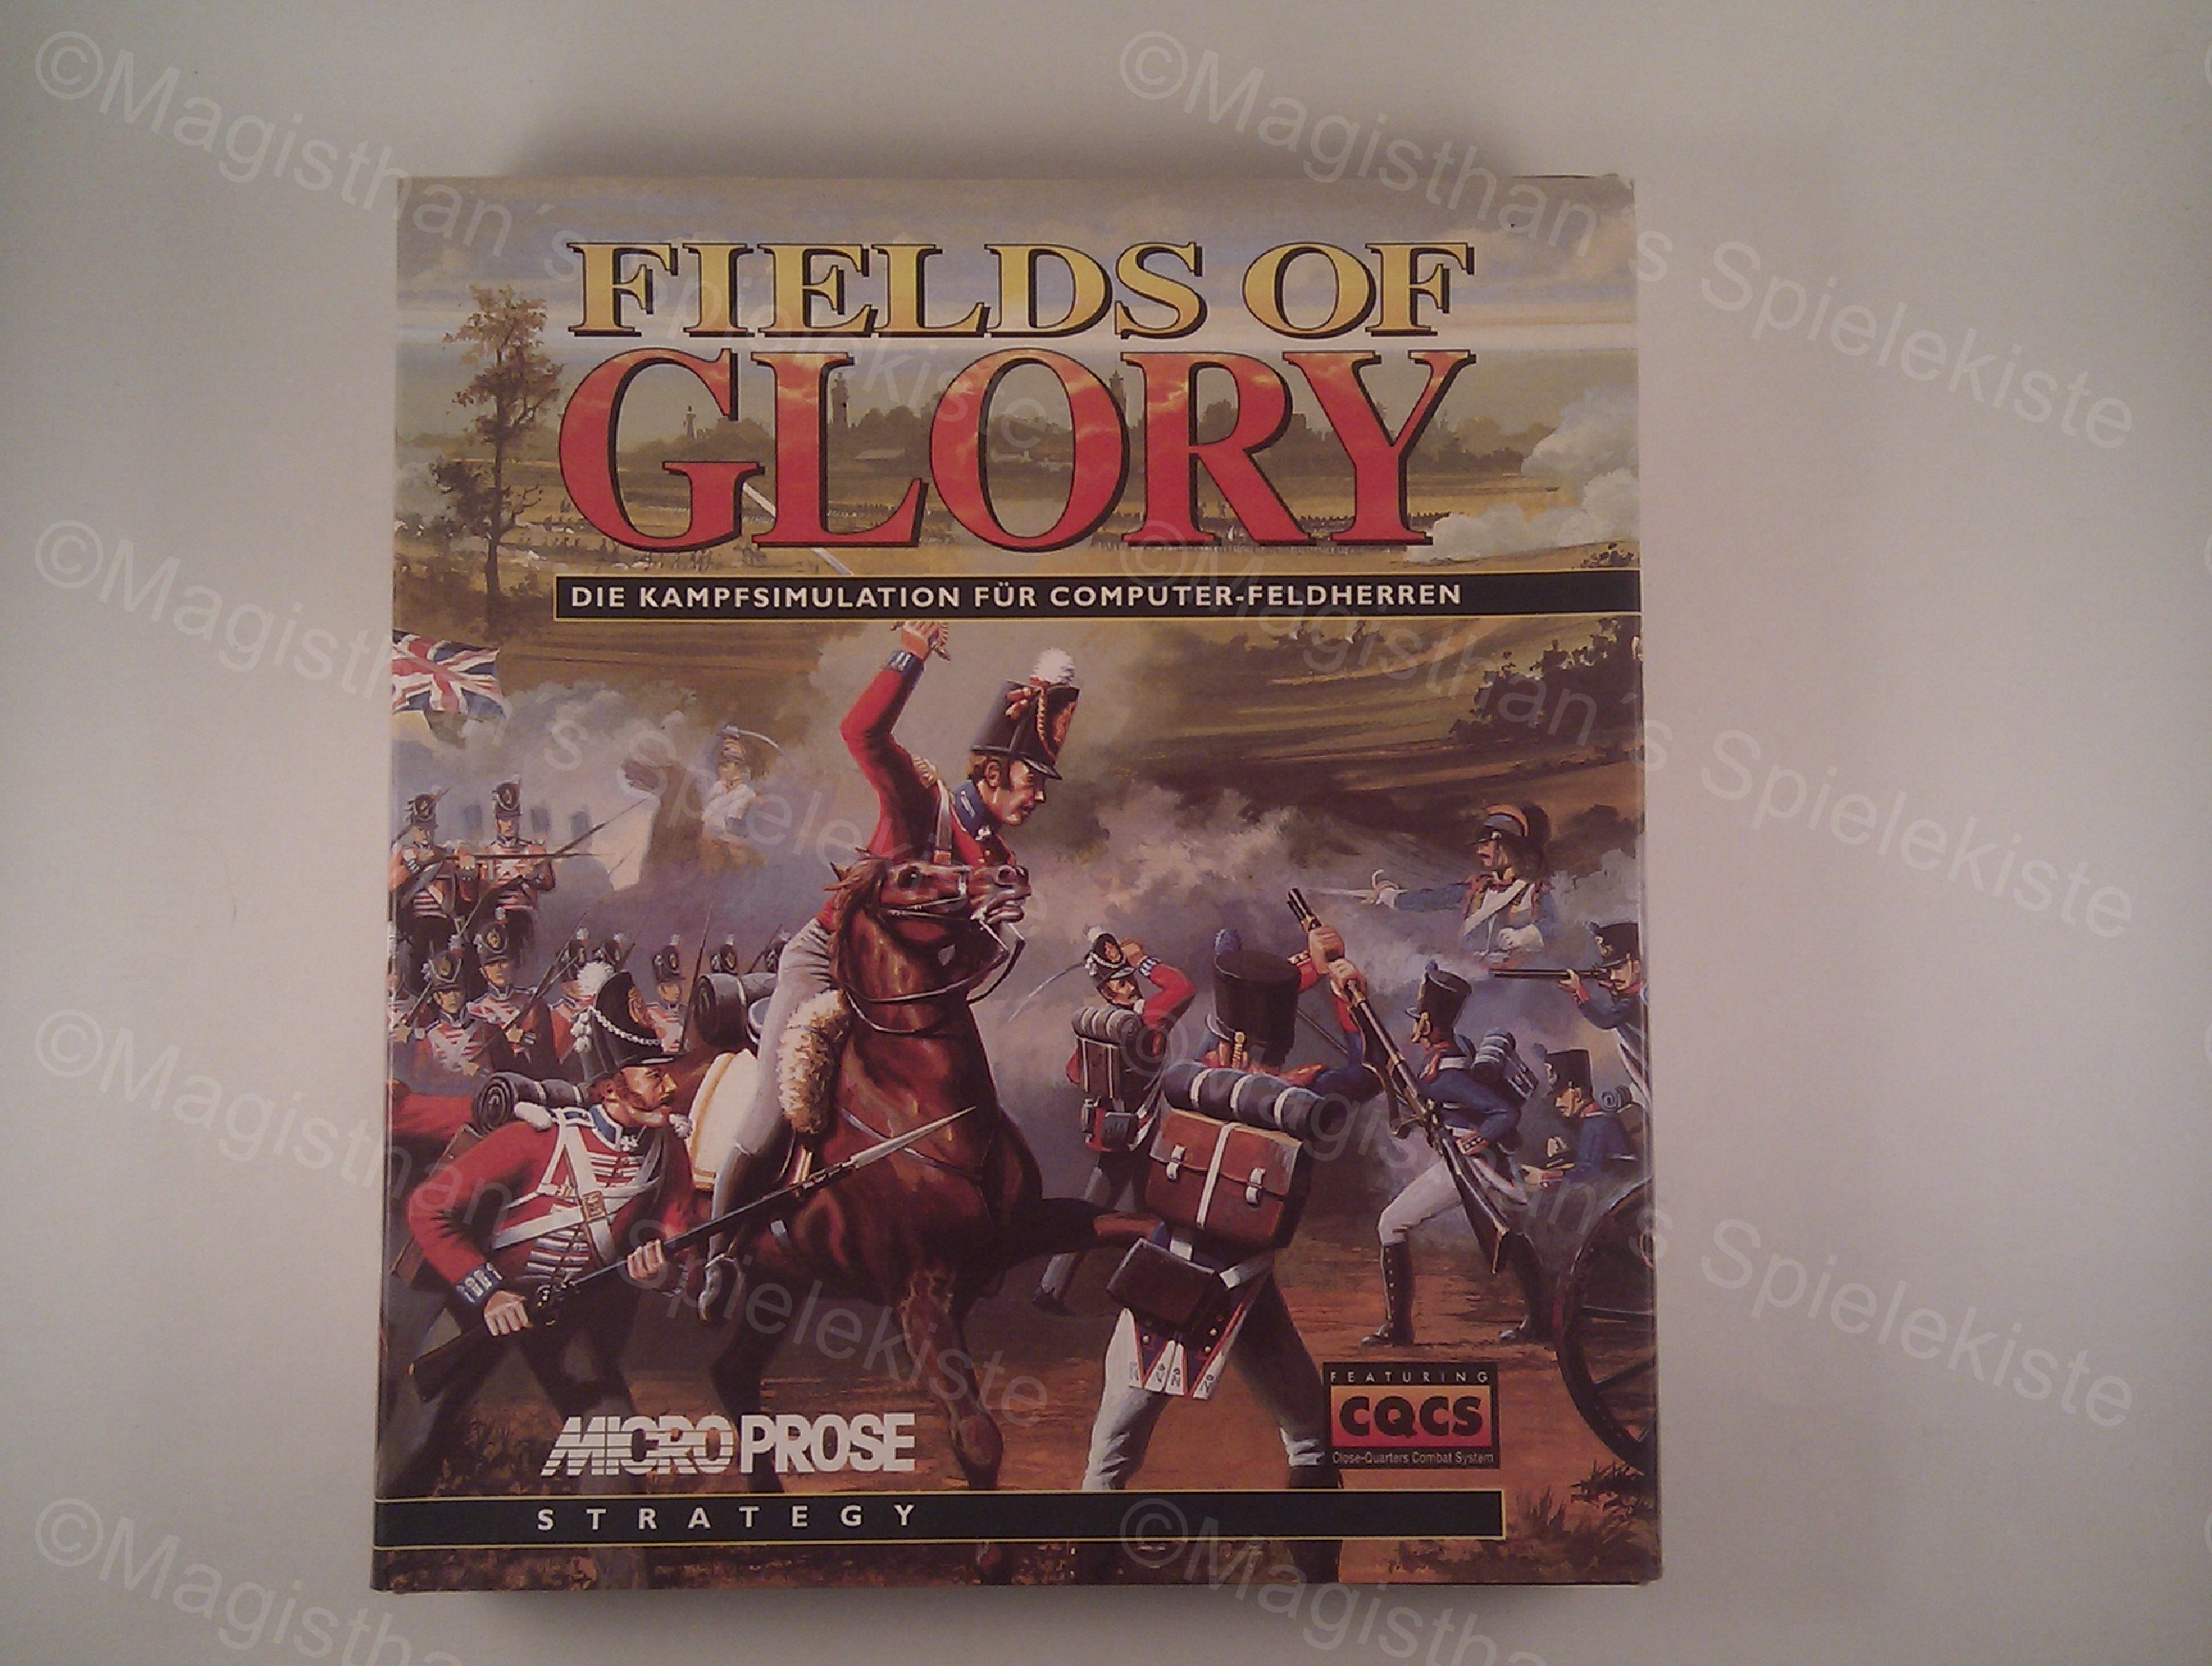 FieldsGlory1.jpg